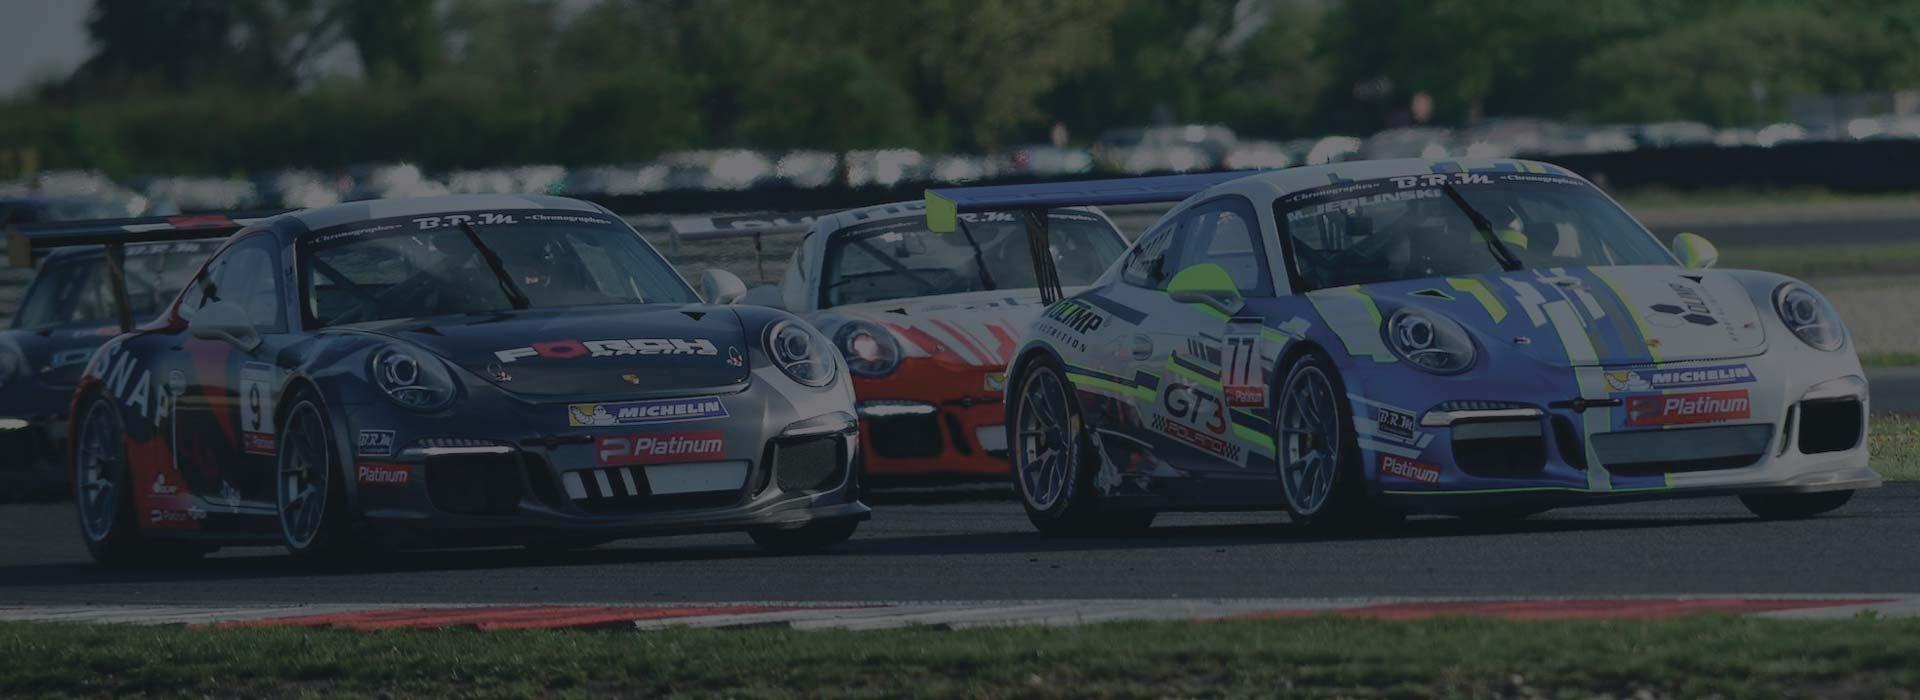 Michelin Pilot Sport GT M